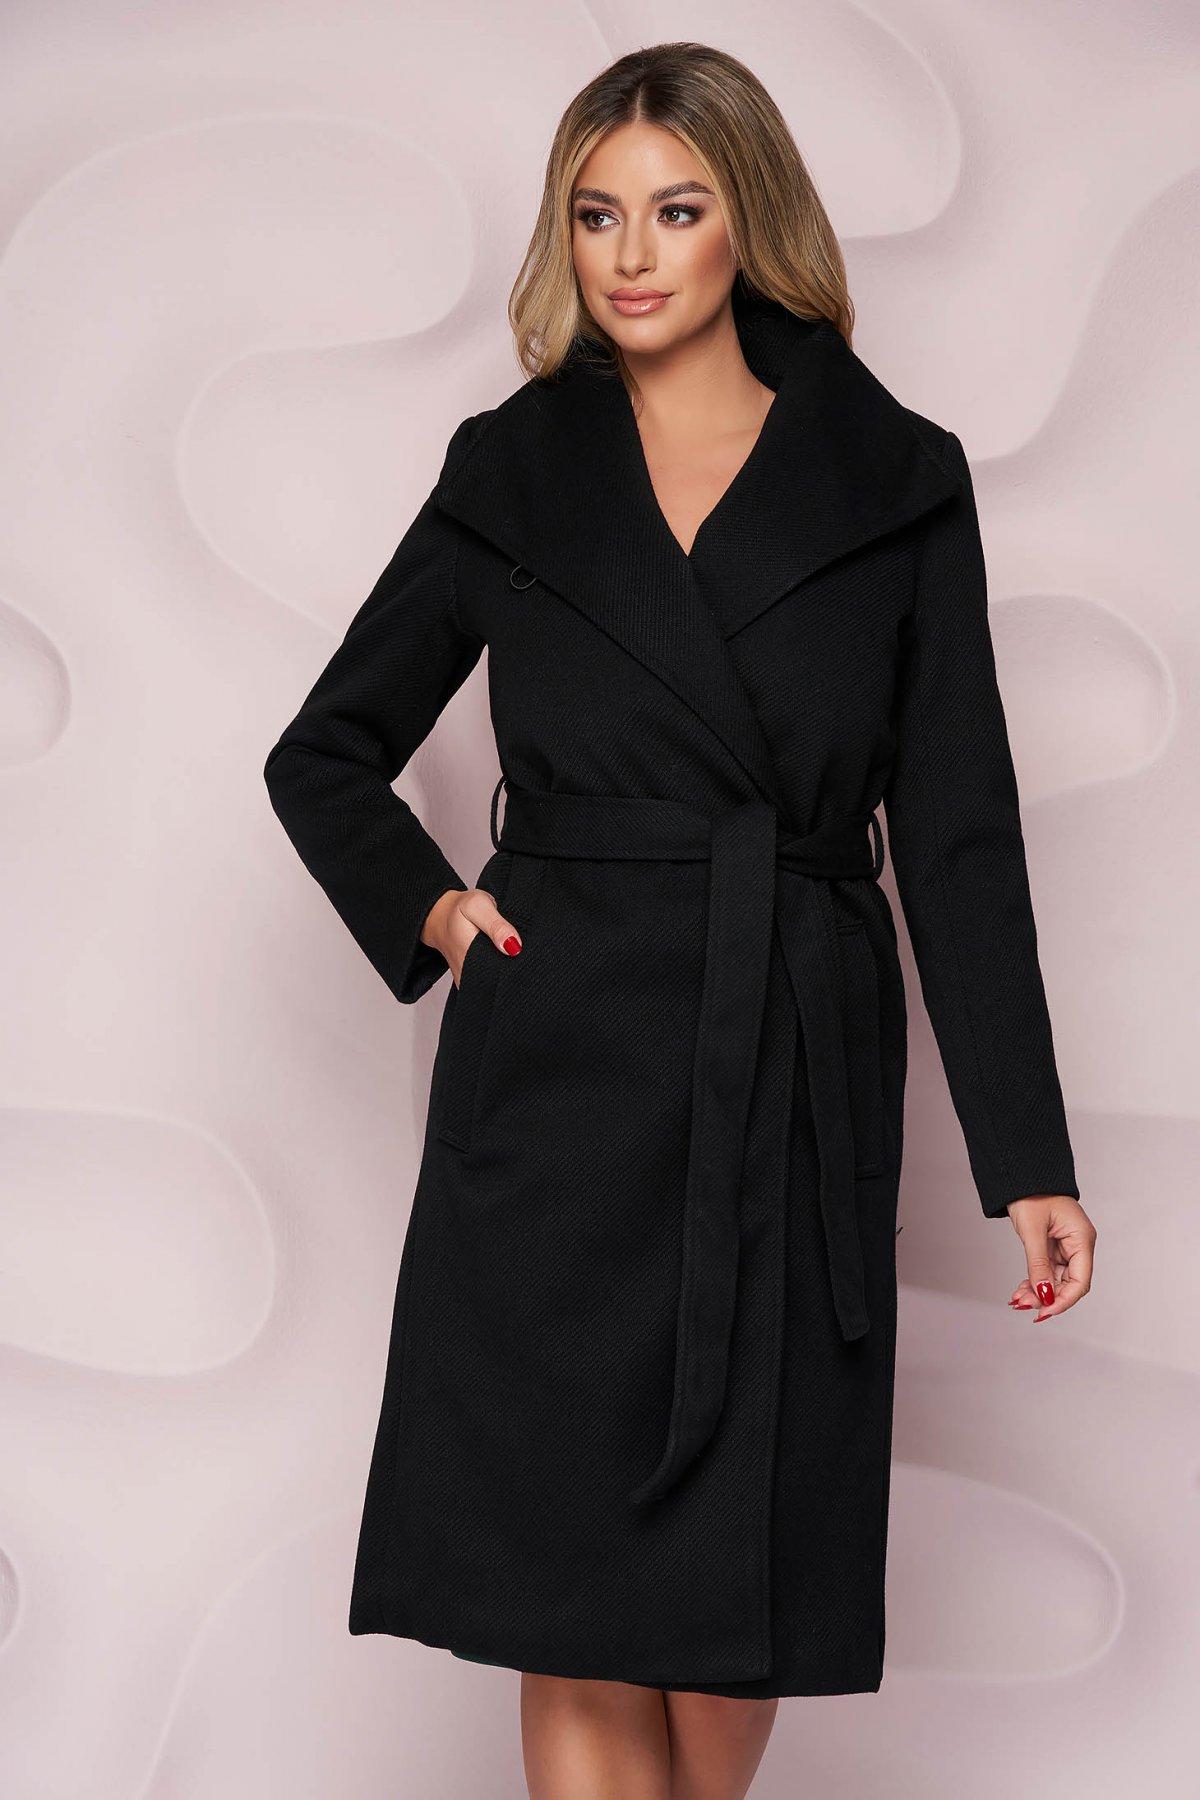 Palton SunShine negru imblanit cu un croi drept din material gros si cordon detasabil